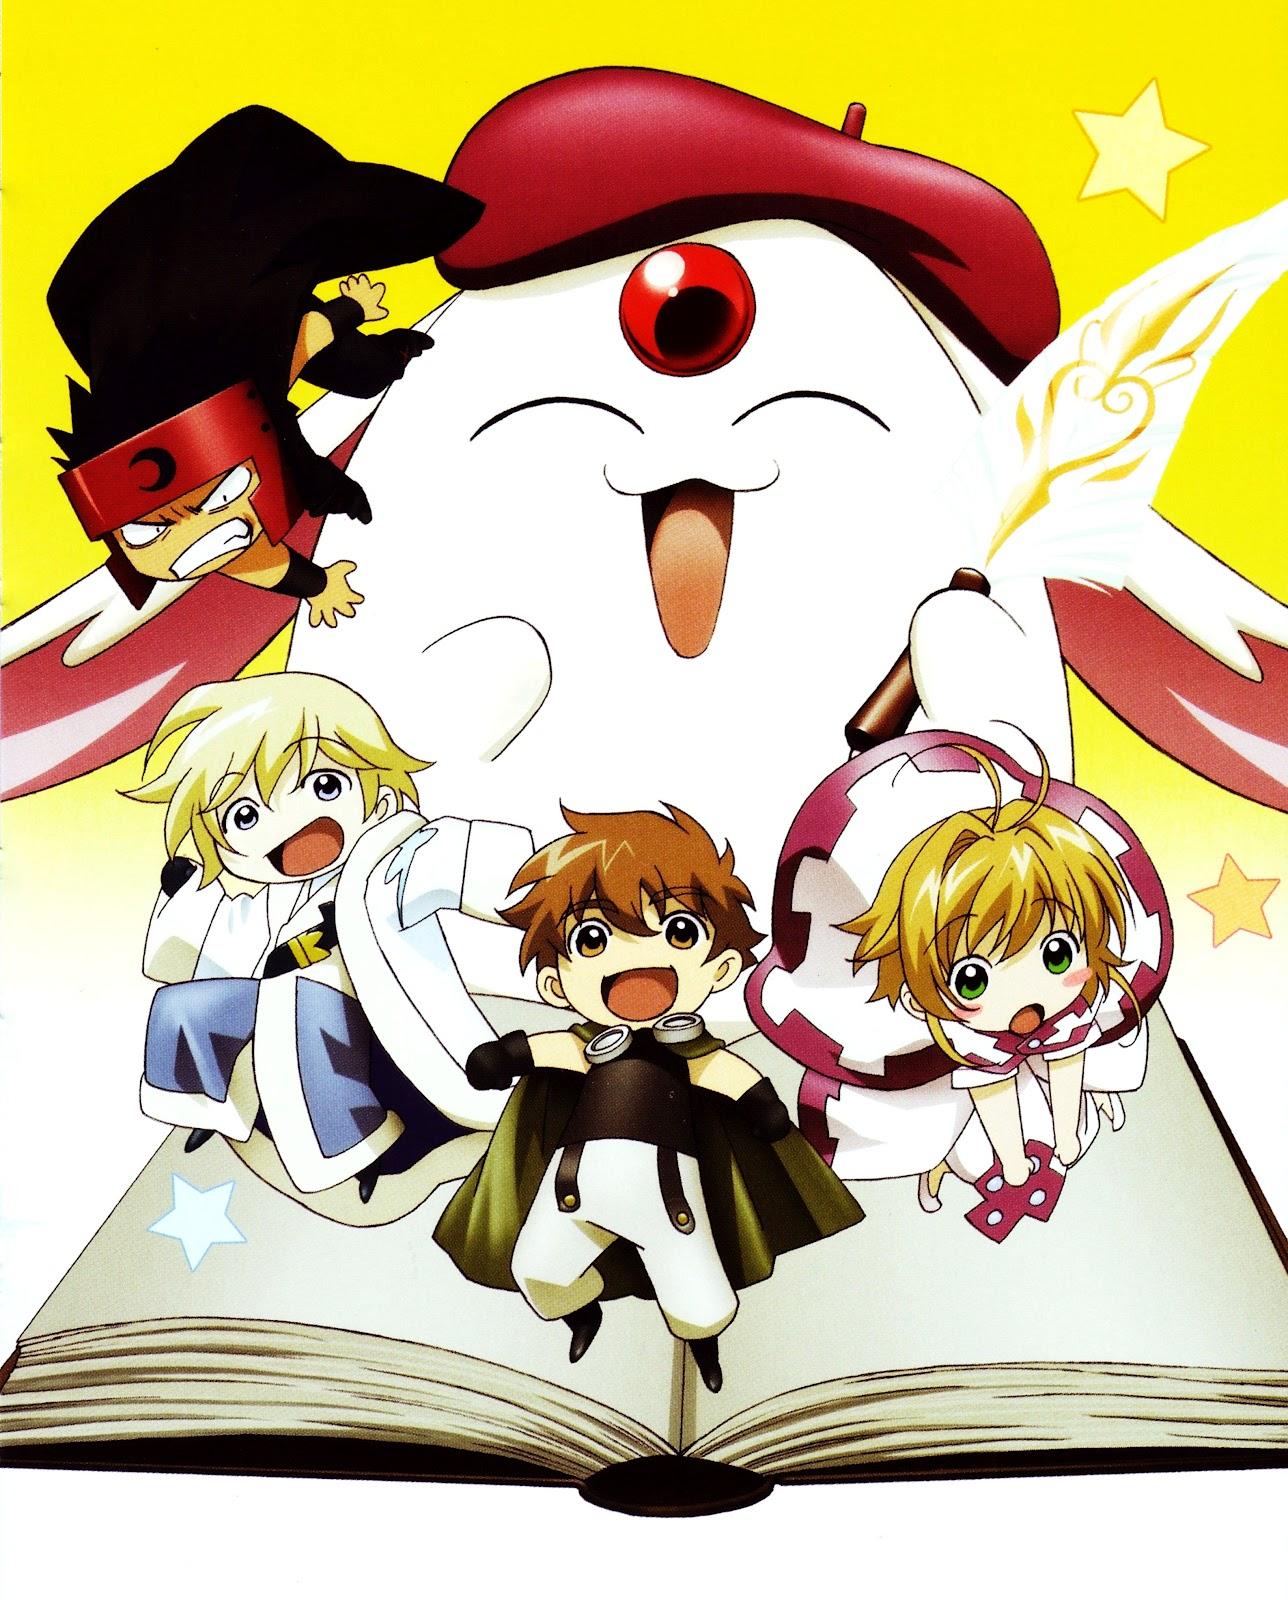 Naty In Wonderland: Tsubasa RESERVoir CHRoNiCLE